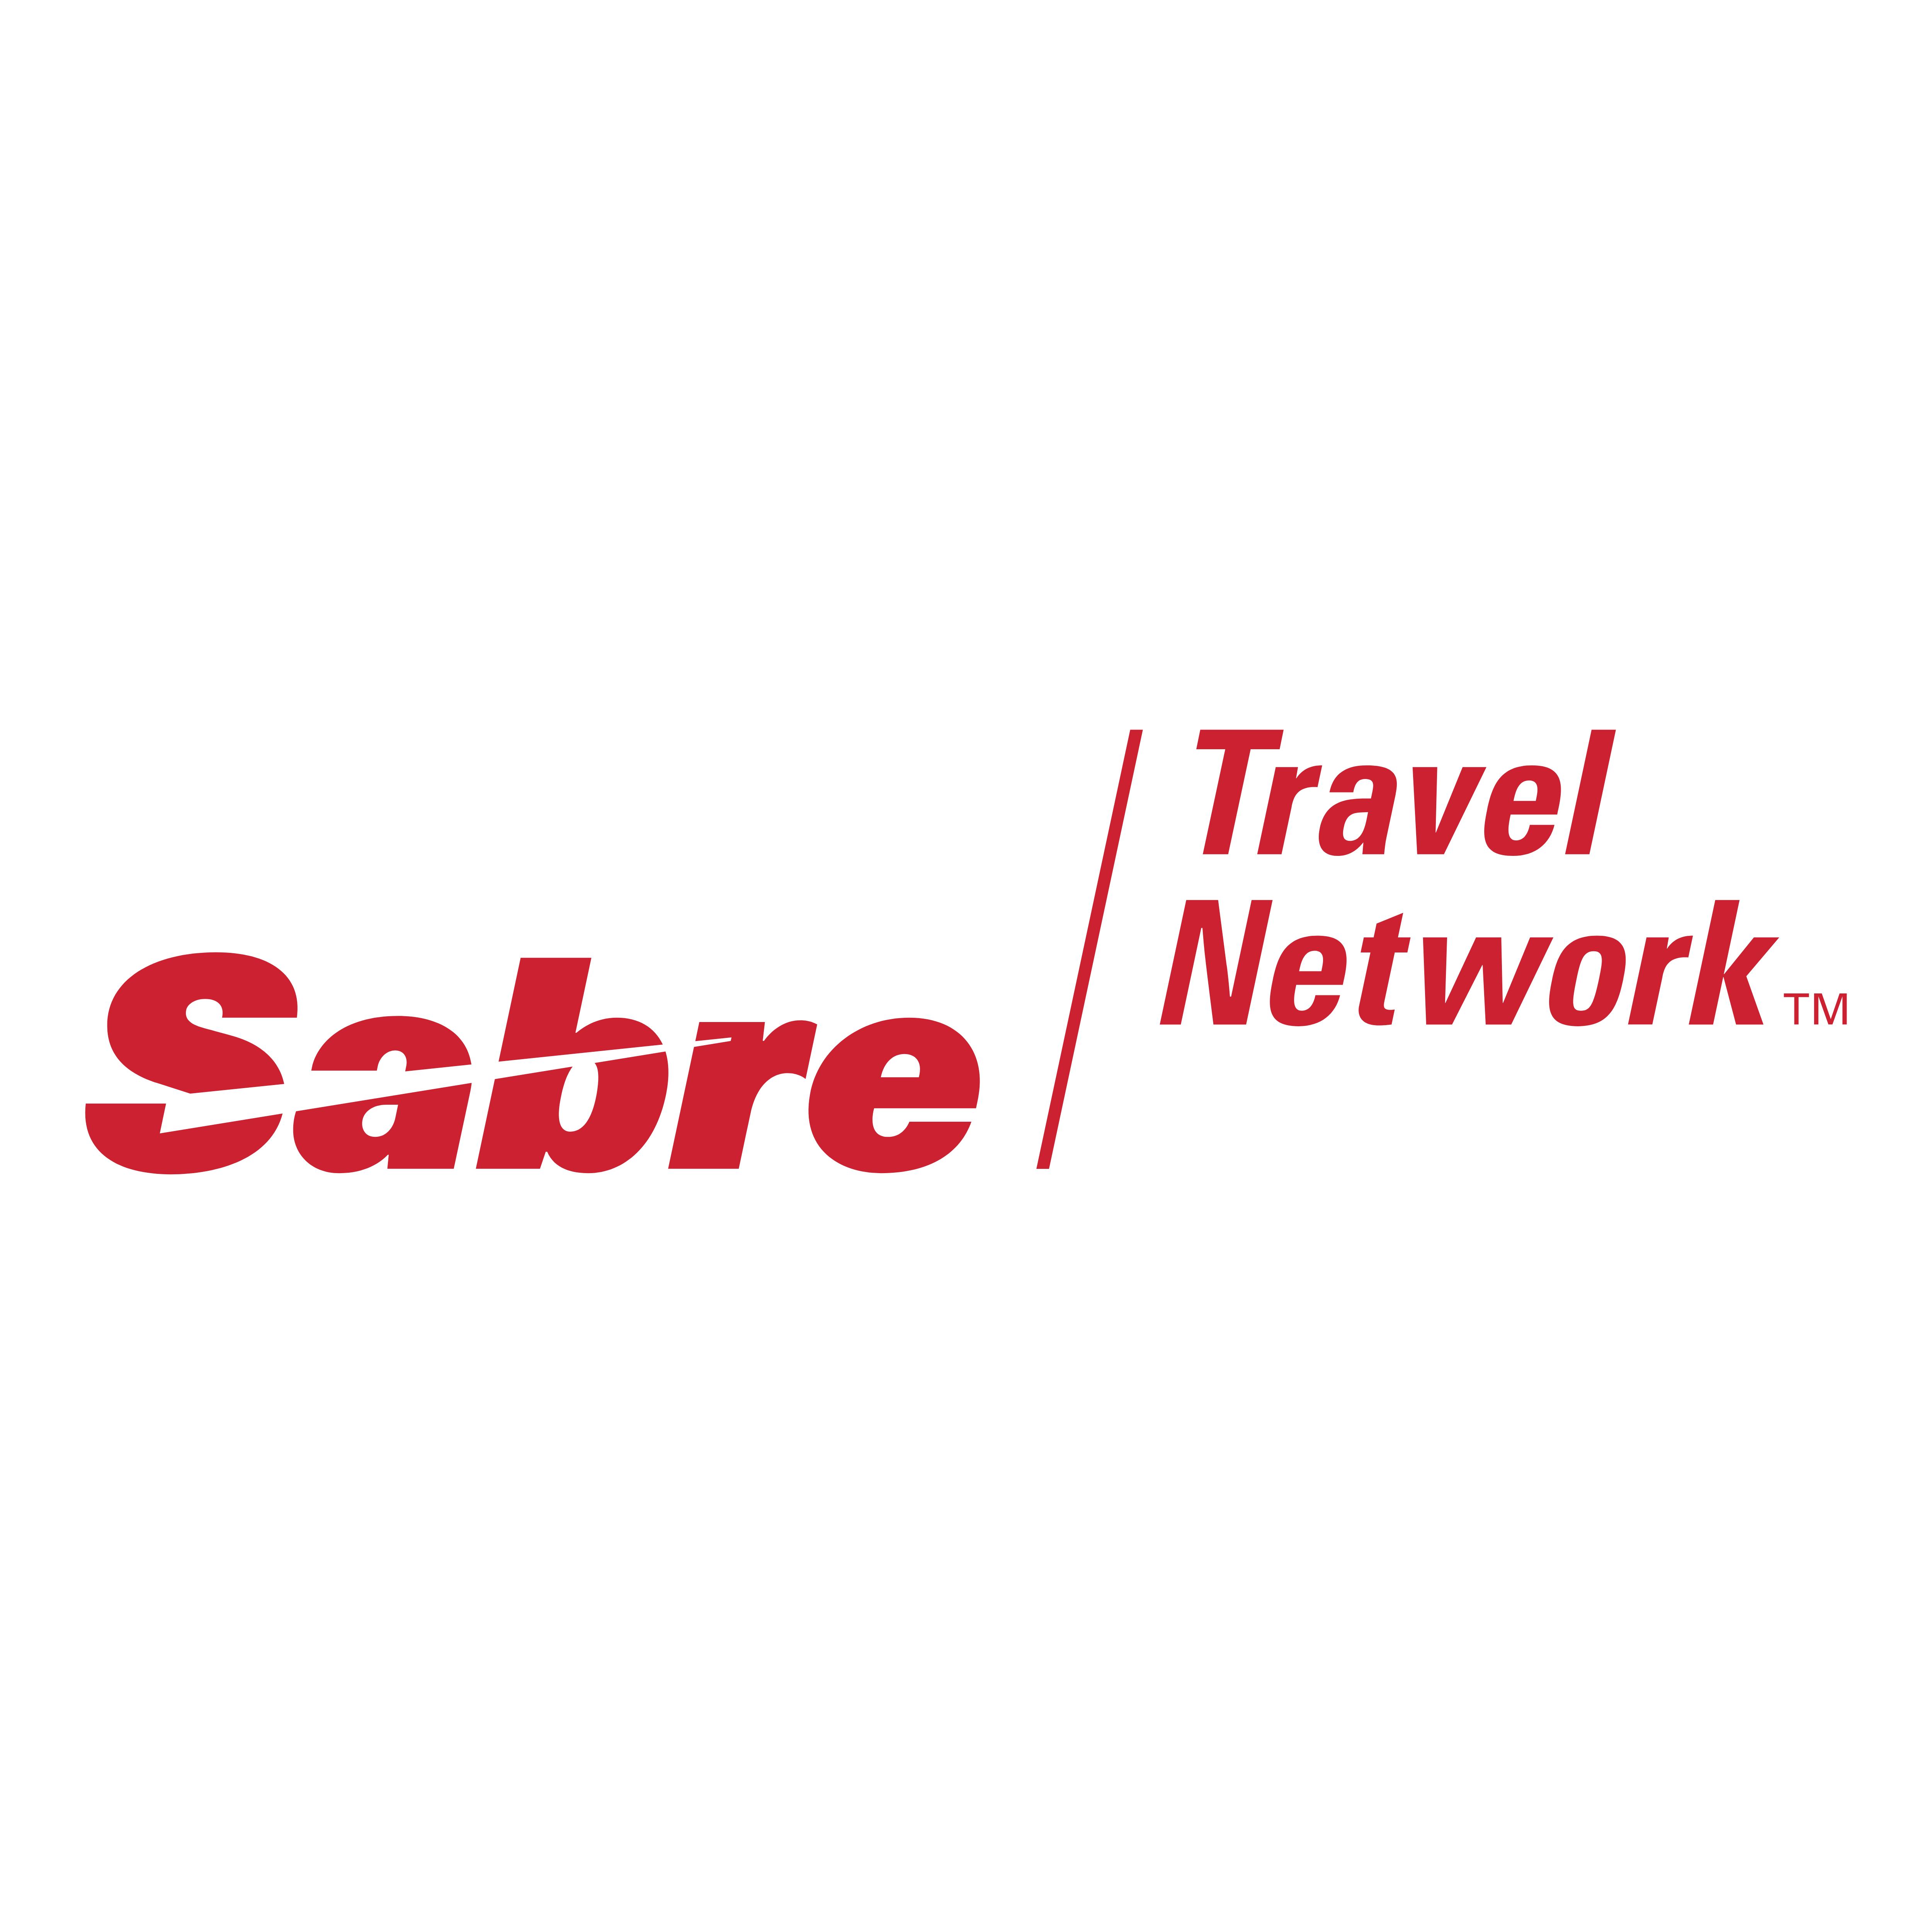 sabre travel network � logos download